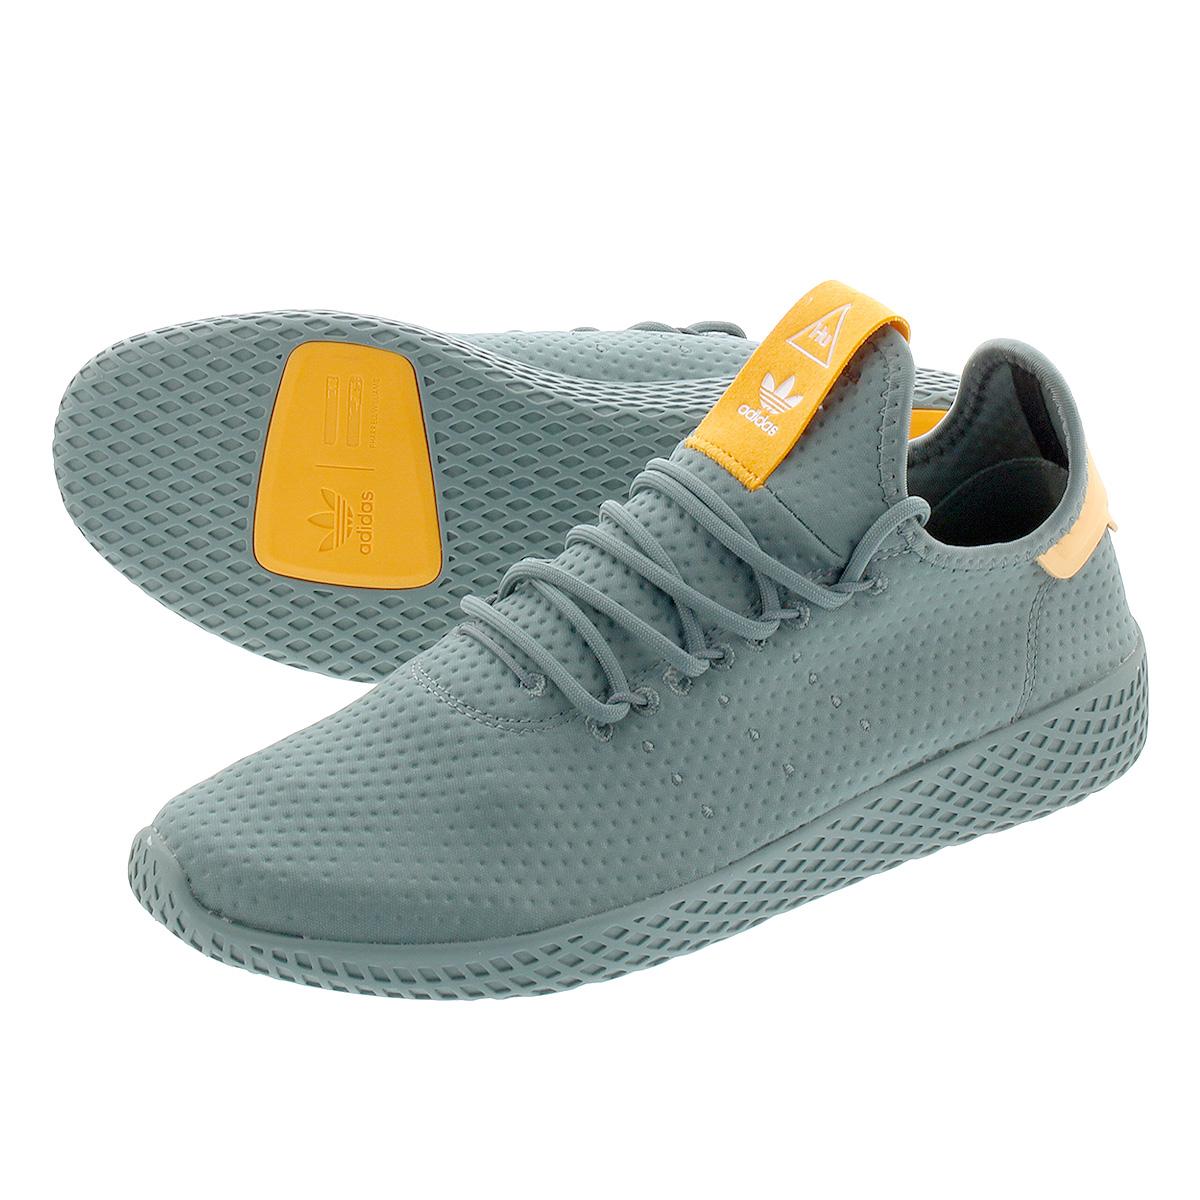 adidas PW TENNIS HU 【adidas Originals x PHARRELL WILLIAMS】 アディダス ファレル ウィリアムス テニス HU RAW GREEN/OFF WHITE b41808